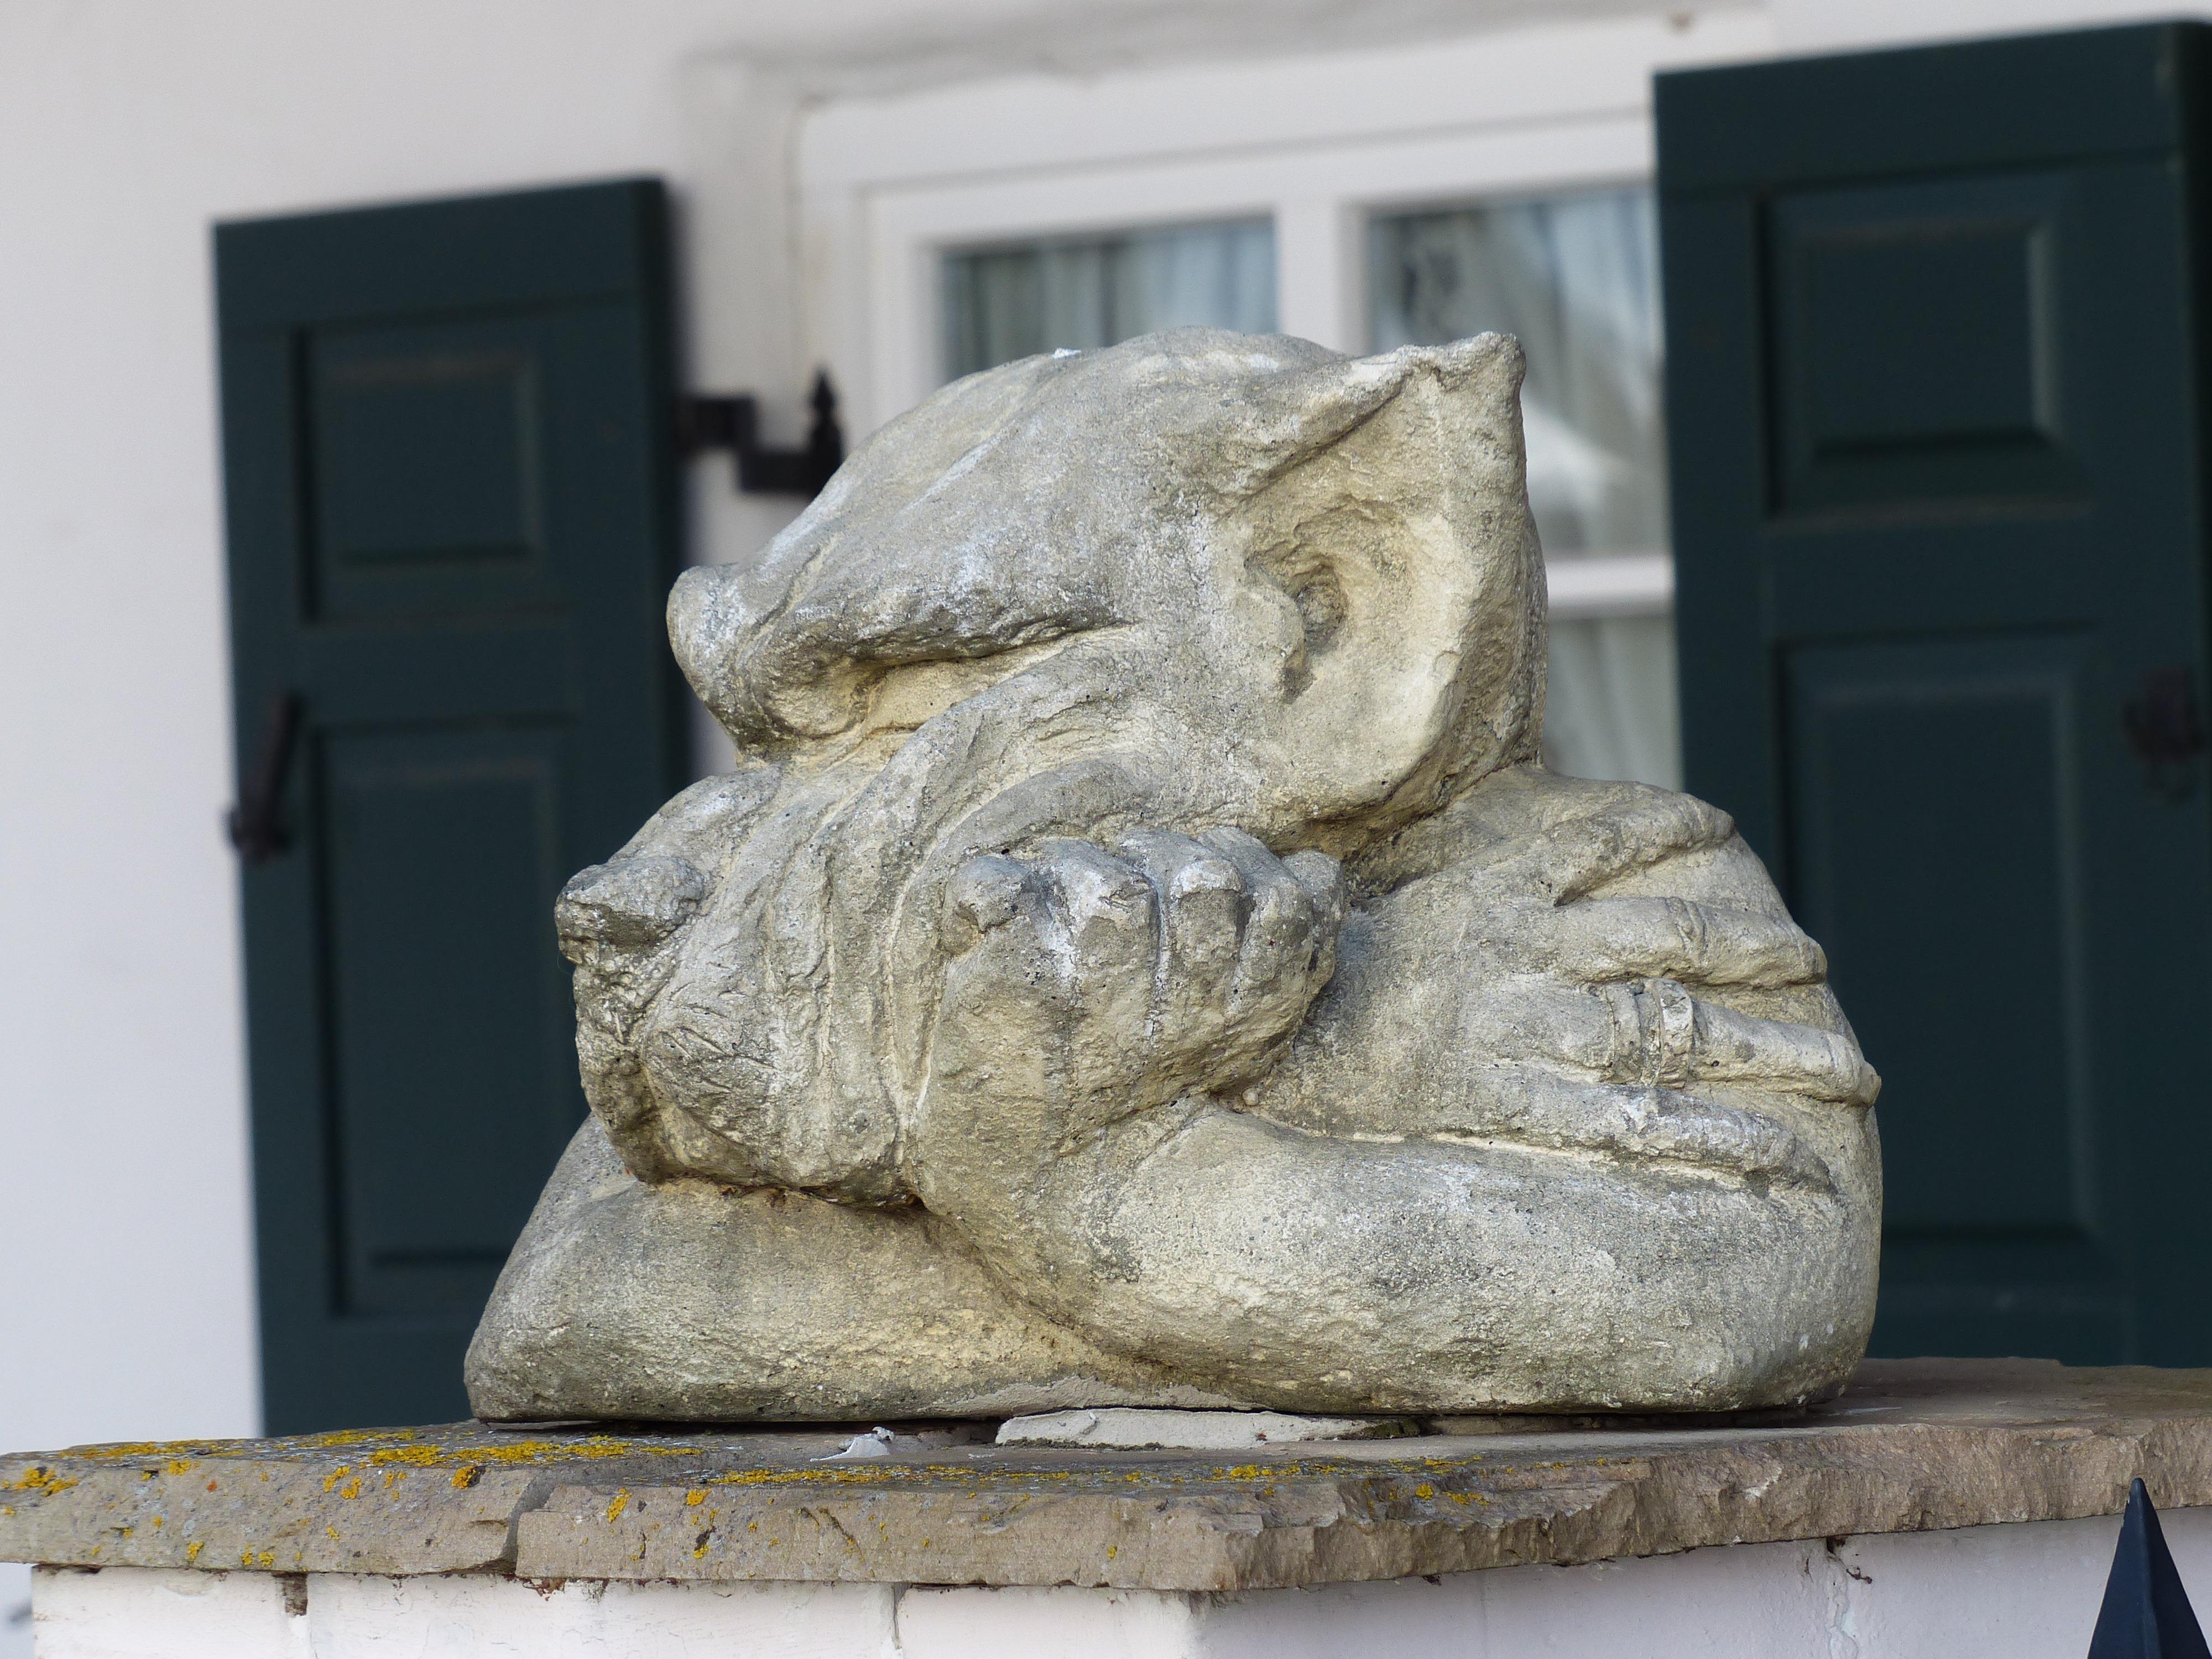 Free Images : rock, wood, dog, monument, wolf, gargoyle, sculpture ...